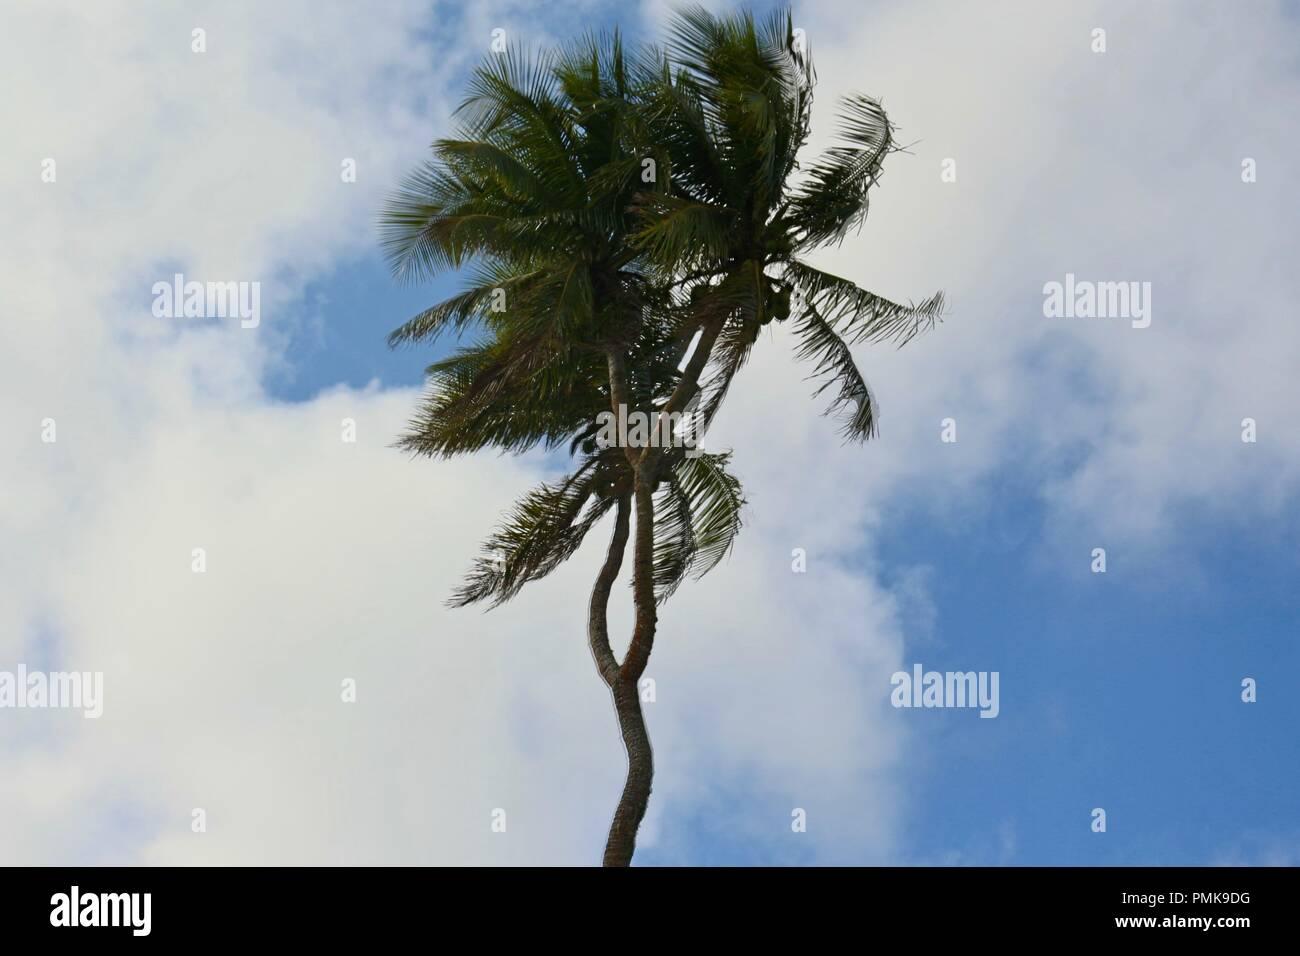 A rare three headed coconut tree on Tongatapu island, Tonga Stock Photo